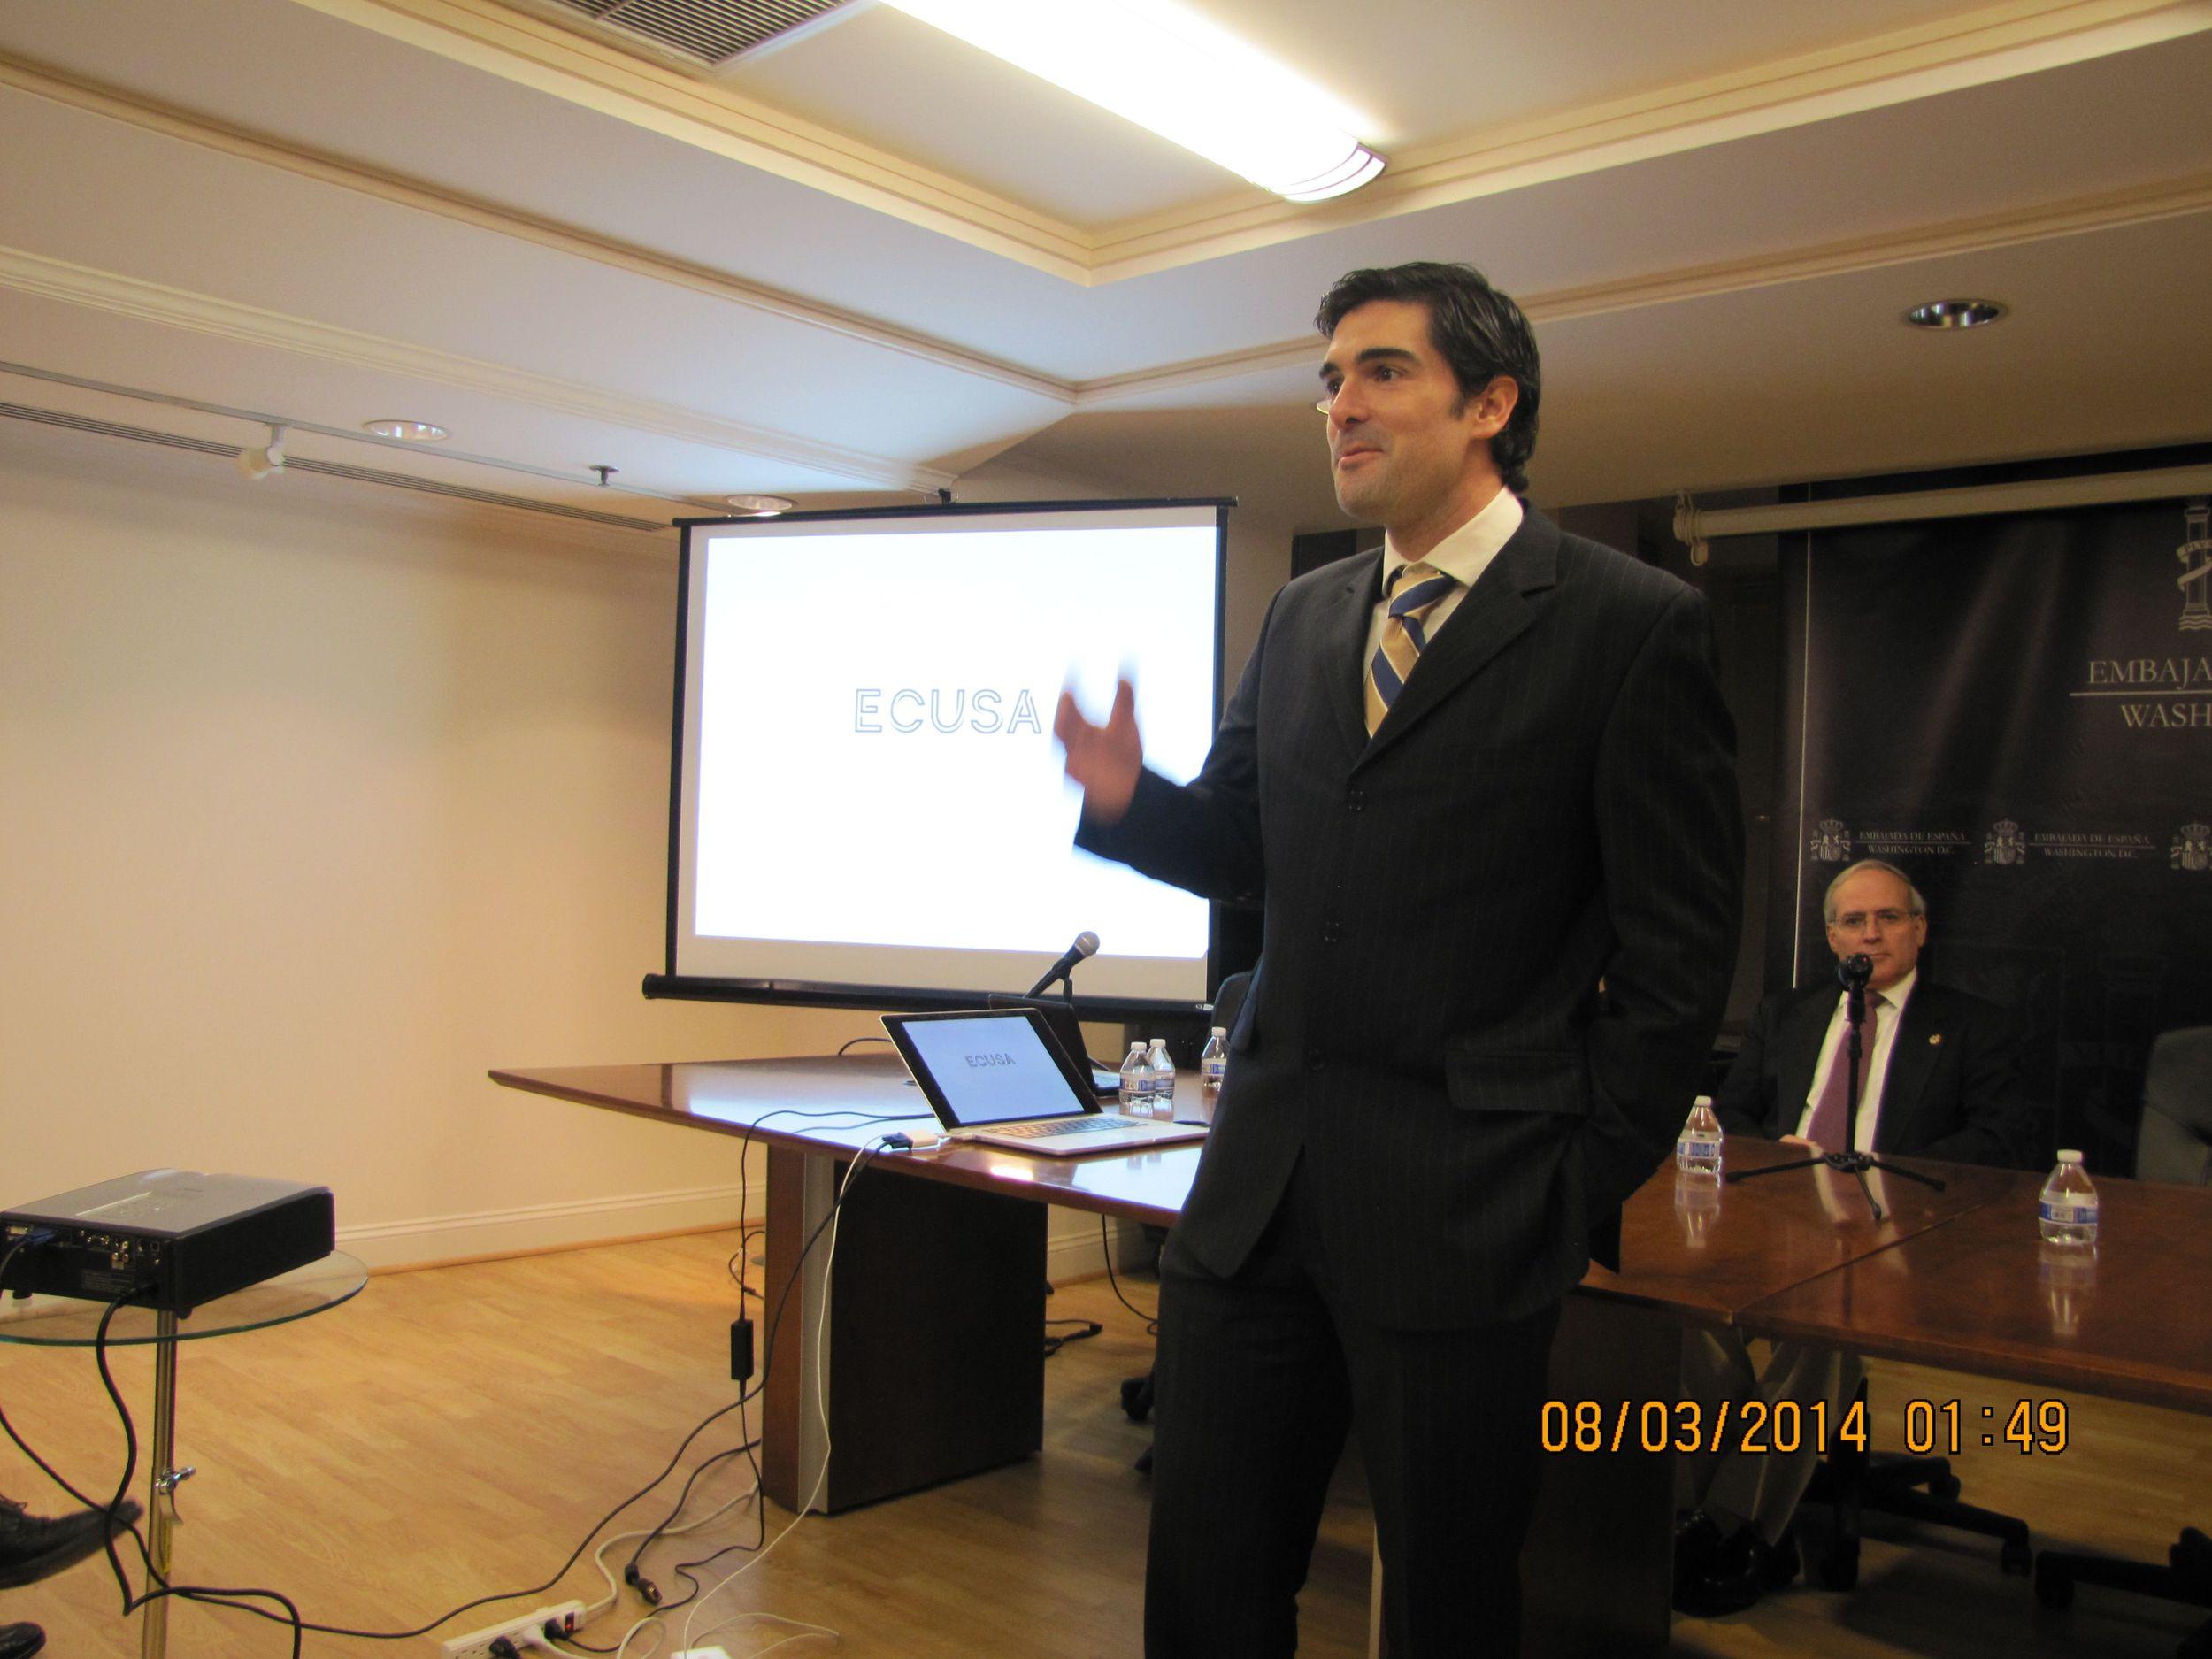 Ignacio Ugarte-Urra, presidente de ECUSA